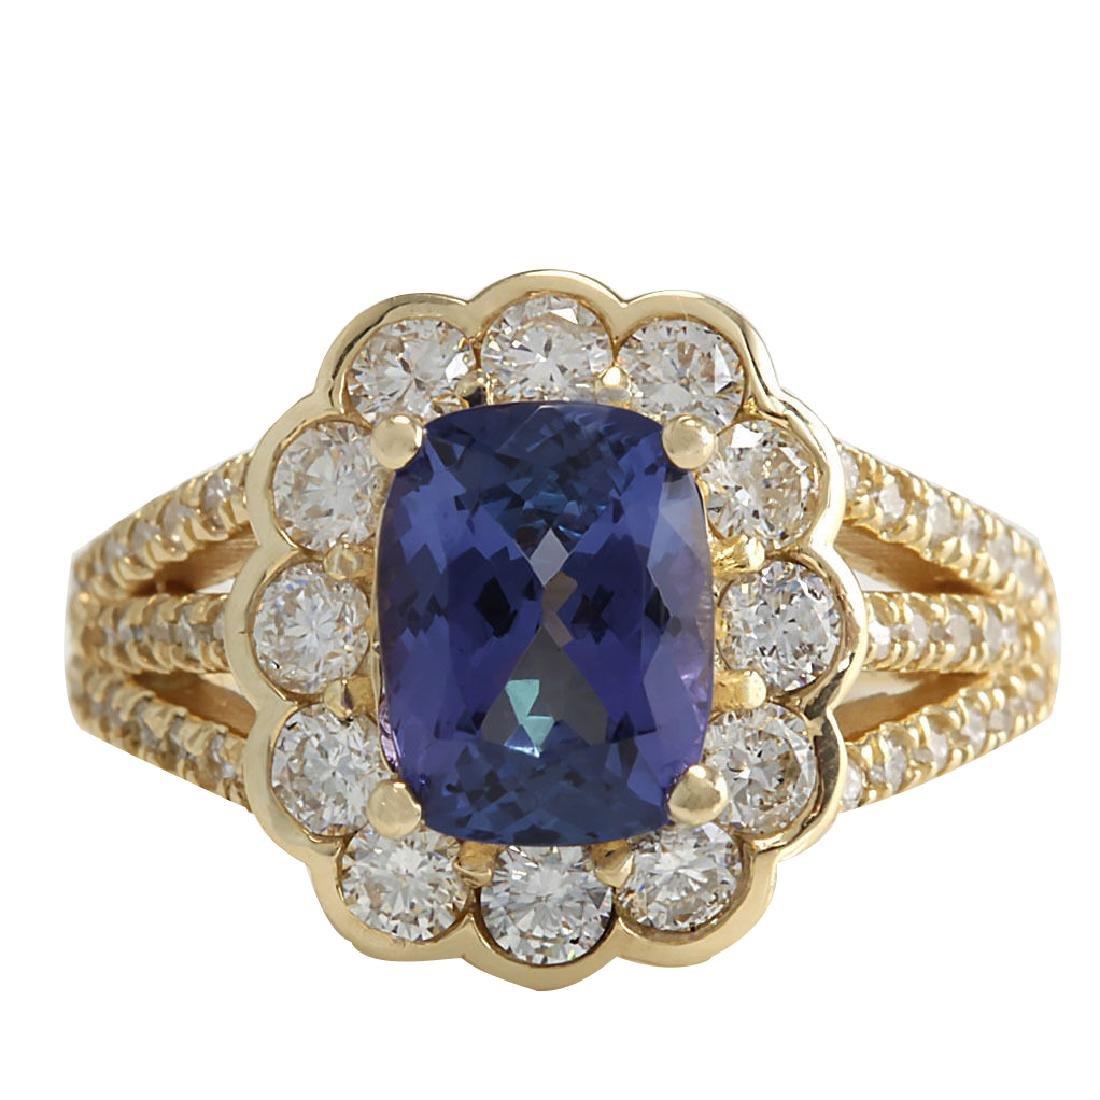 3.65CTW Natural Tanzanite And Diamond Ring In 18K